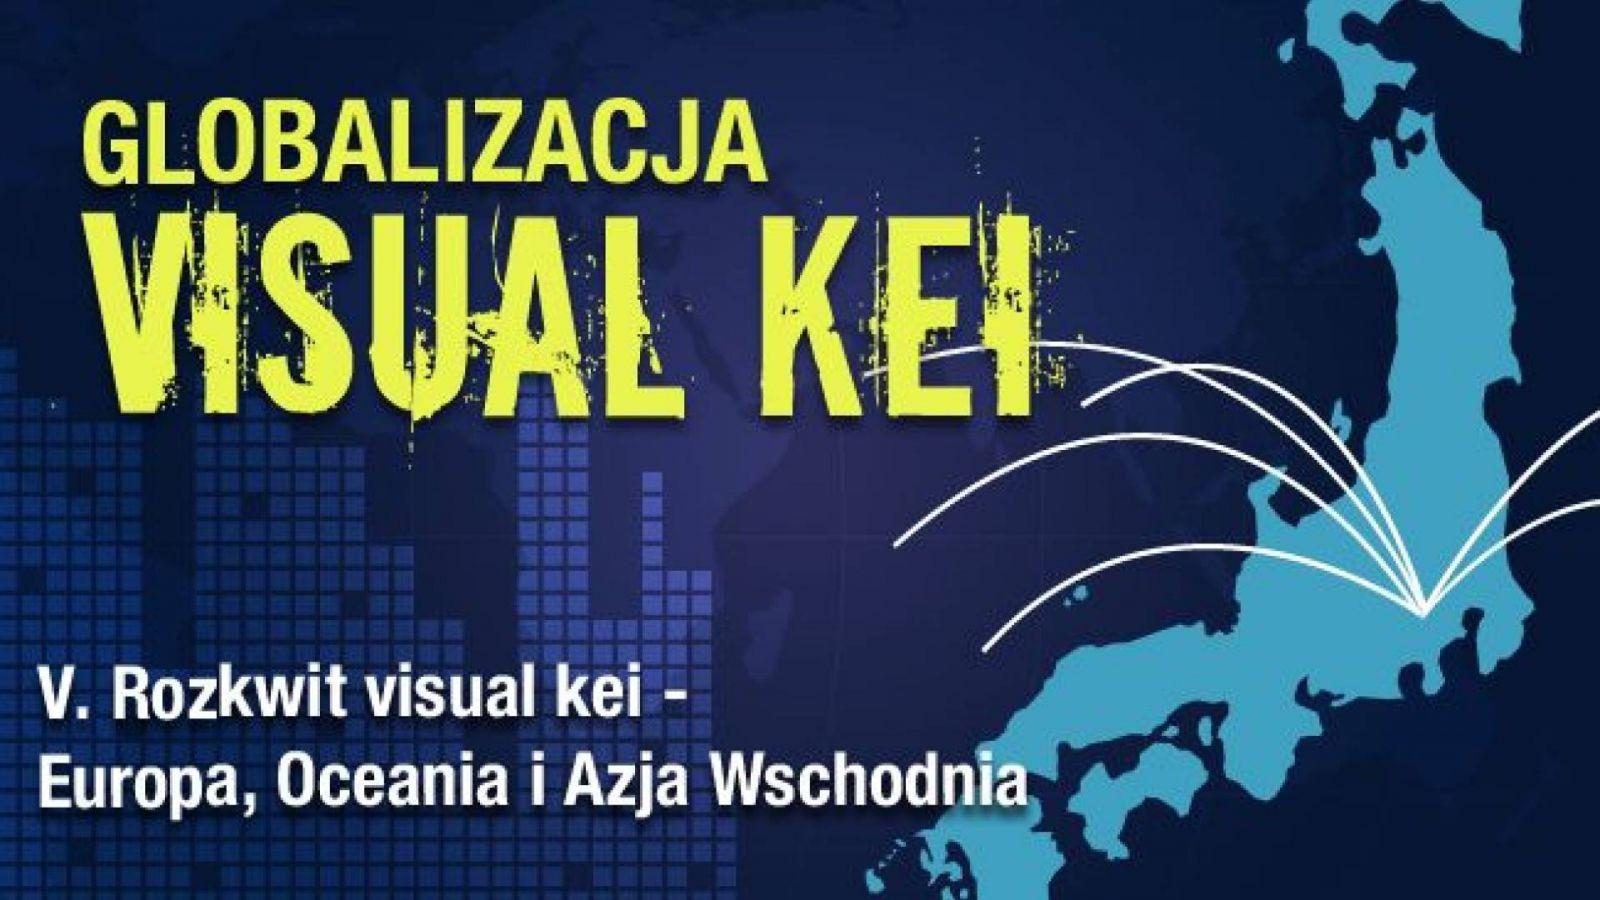 Globalizacja visual kei: Rozkwit visual kei - Europa, Oceania i Azja Wschodnia © Lydia Michalitsianos